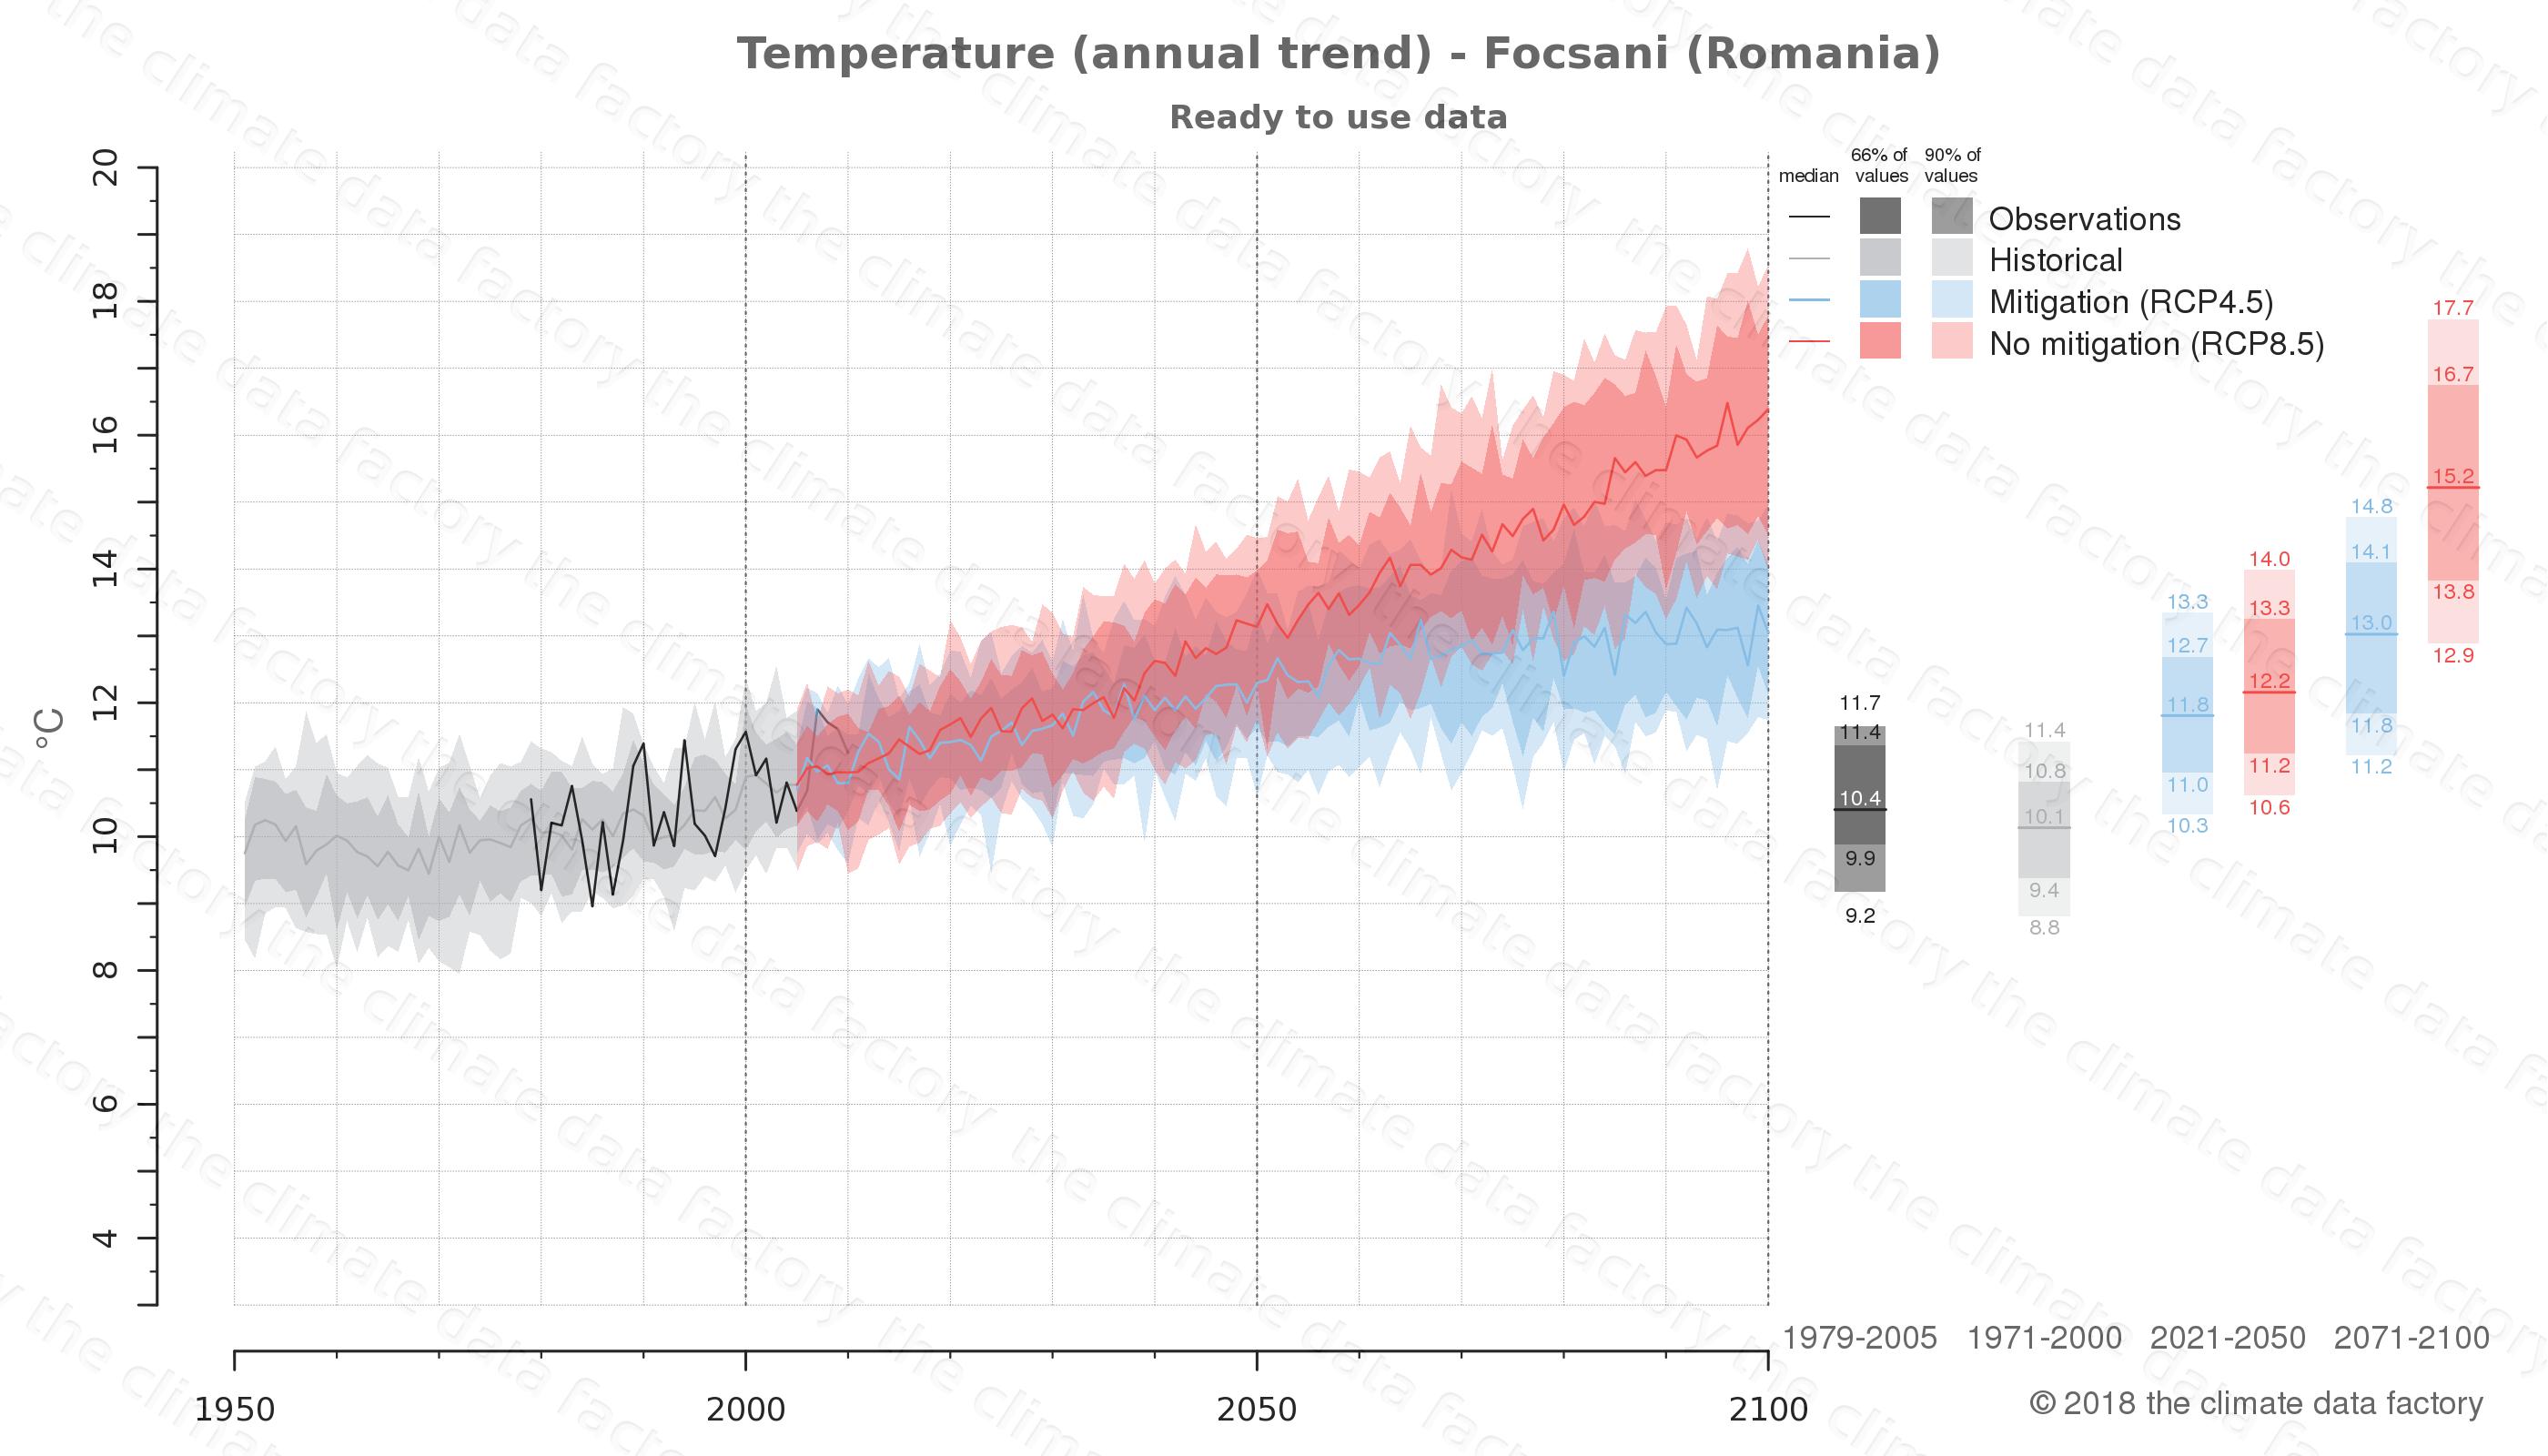 climate change data policy adaptation climate graph city data temperature focsani romania